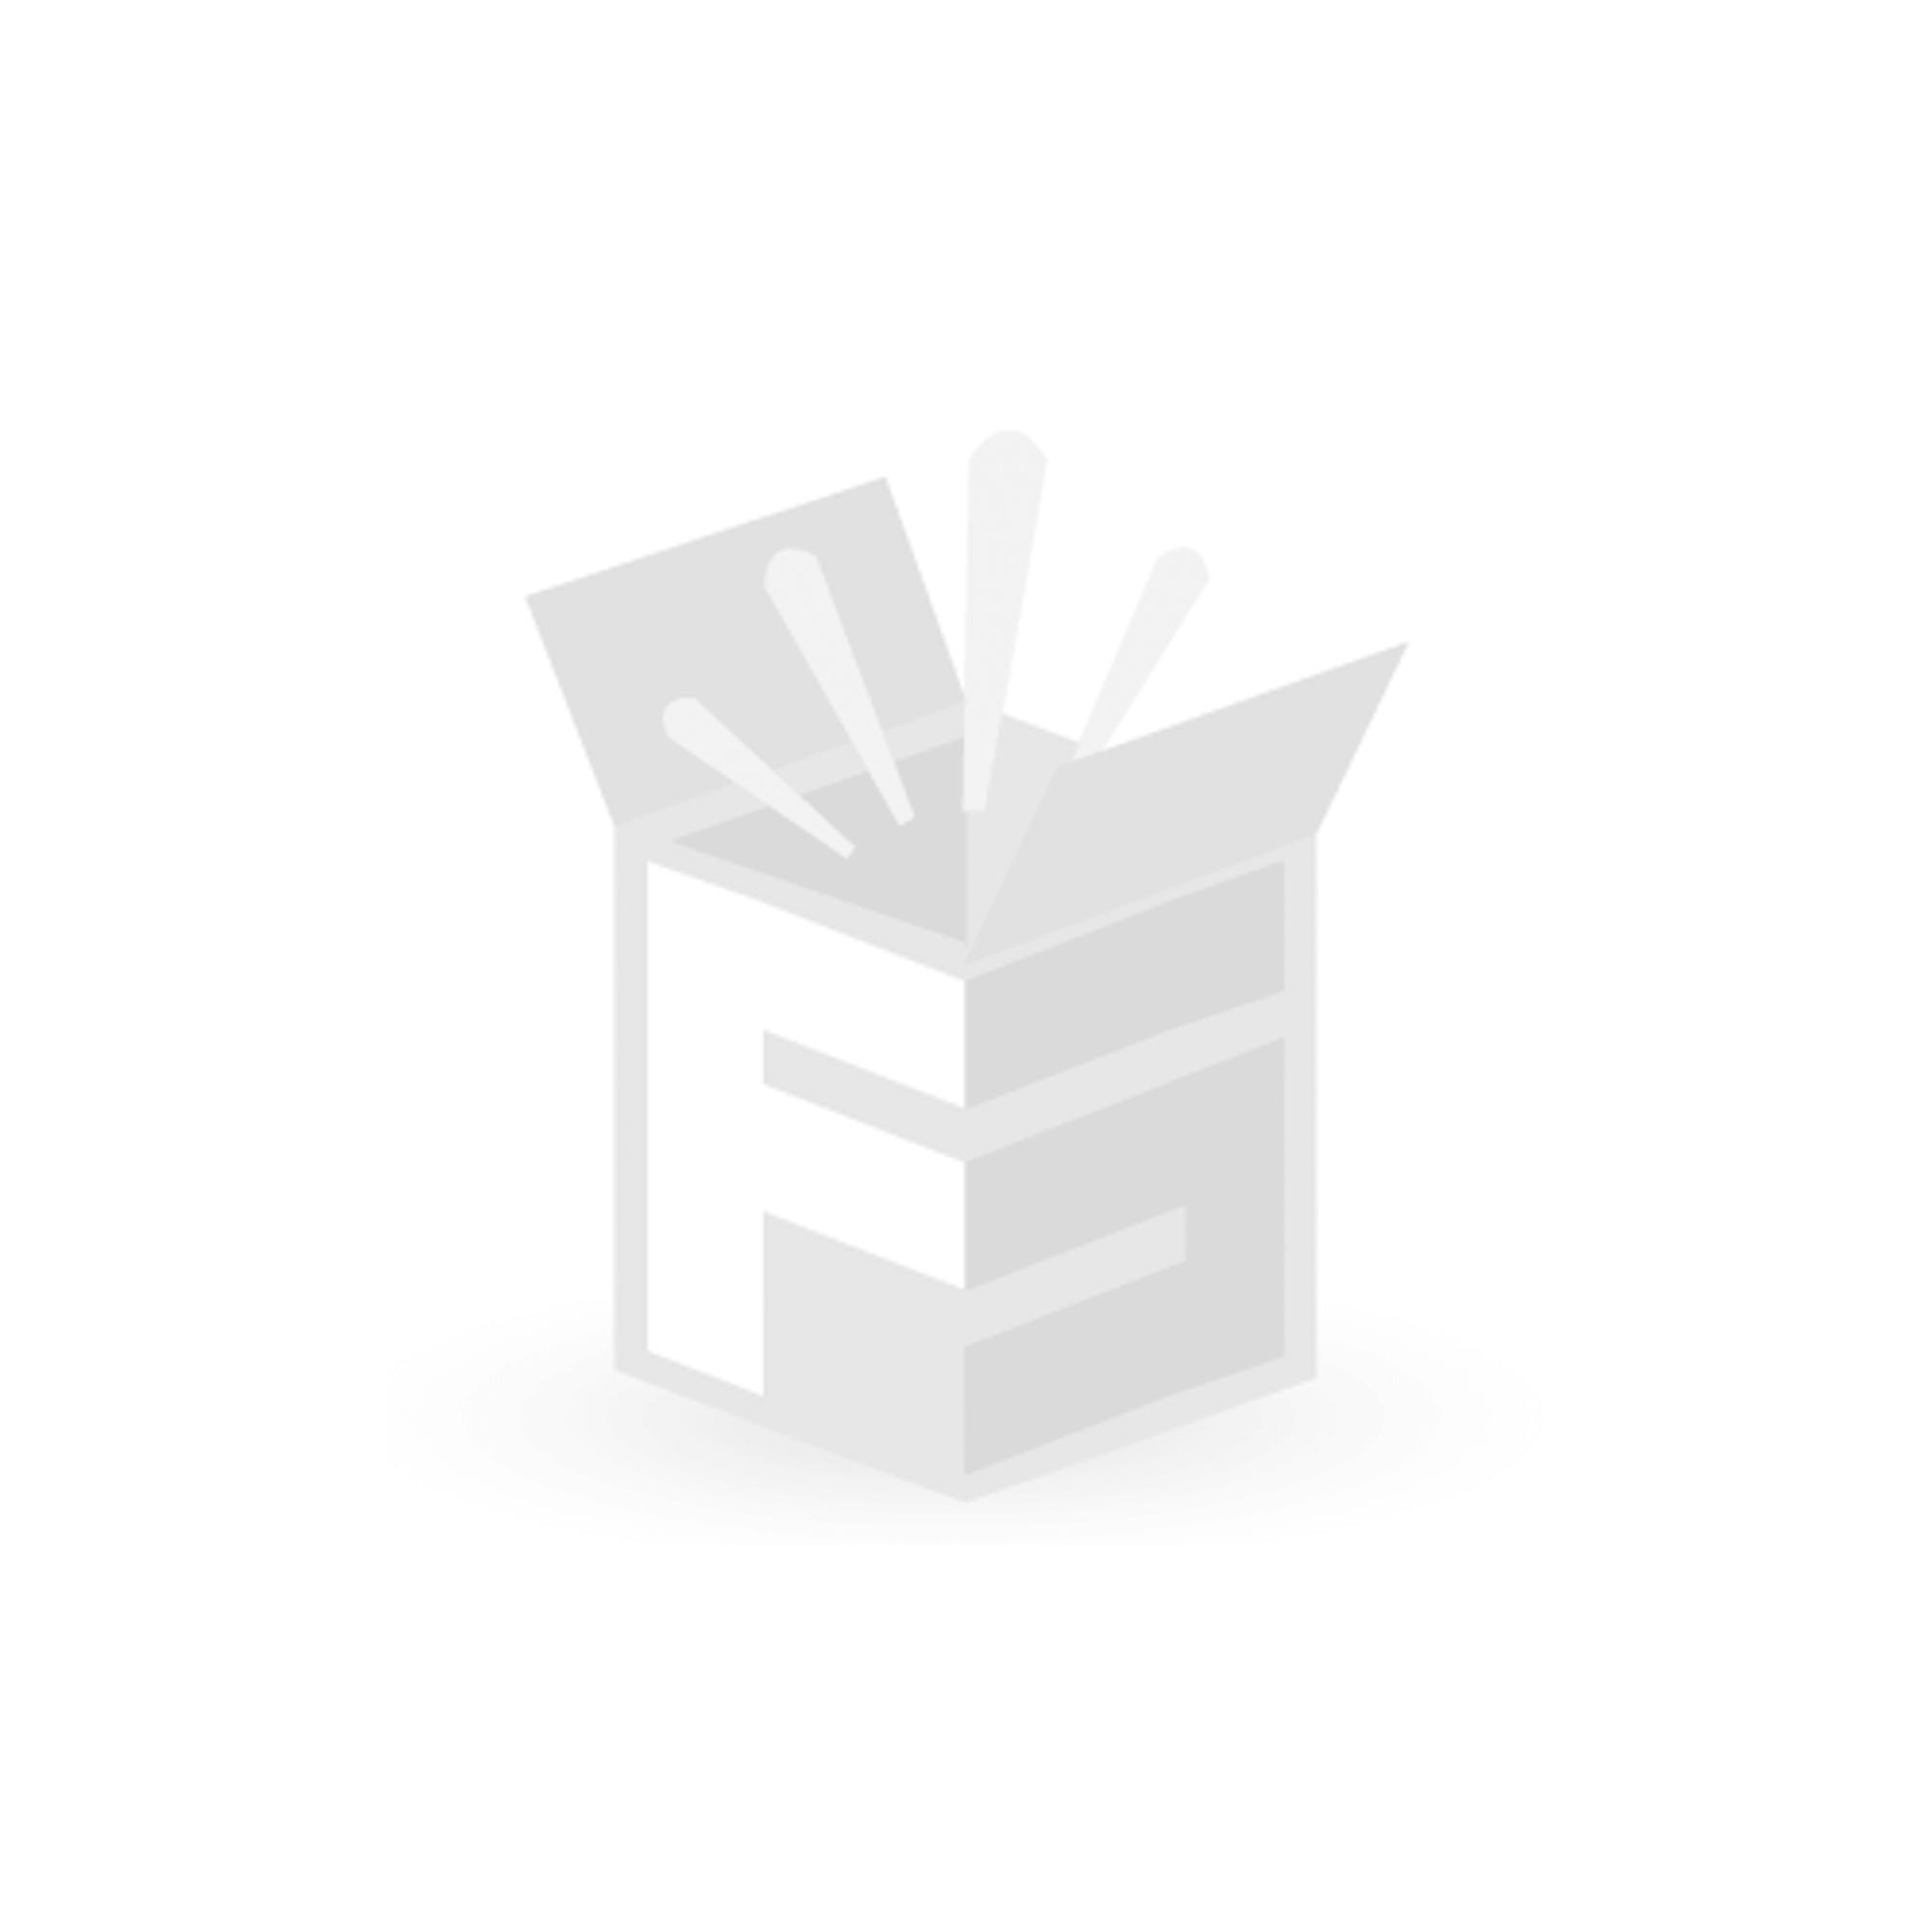 bosch akku bohrschrauber gsr 18 v 85c 2x 5 0 ah inkl koffer. Black Bedroom Furniture Sets. Home Design Ideas